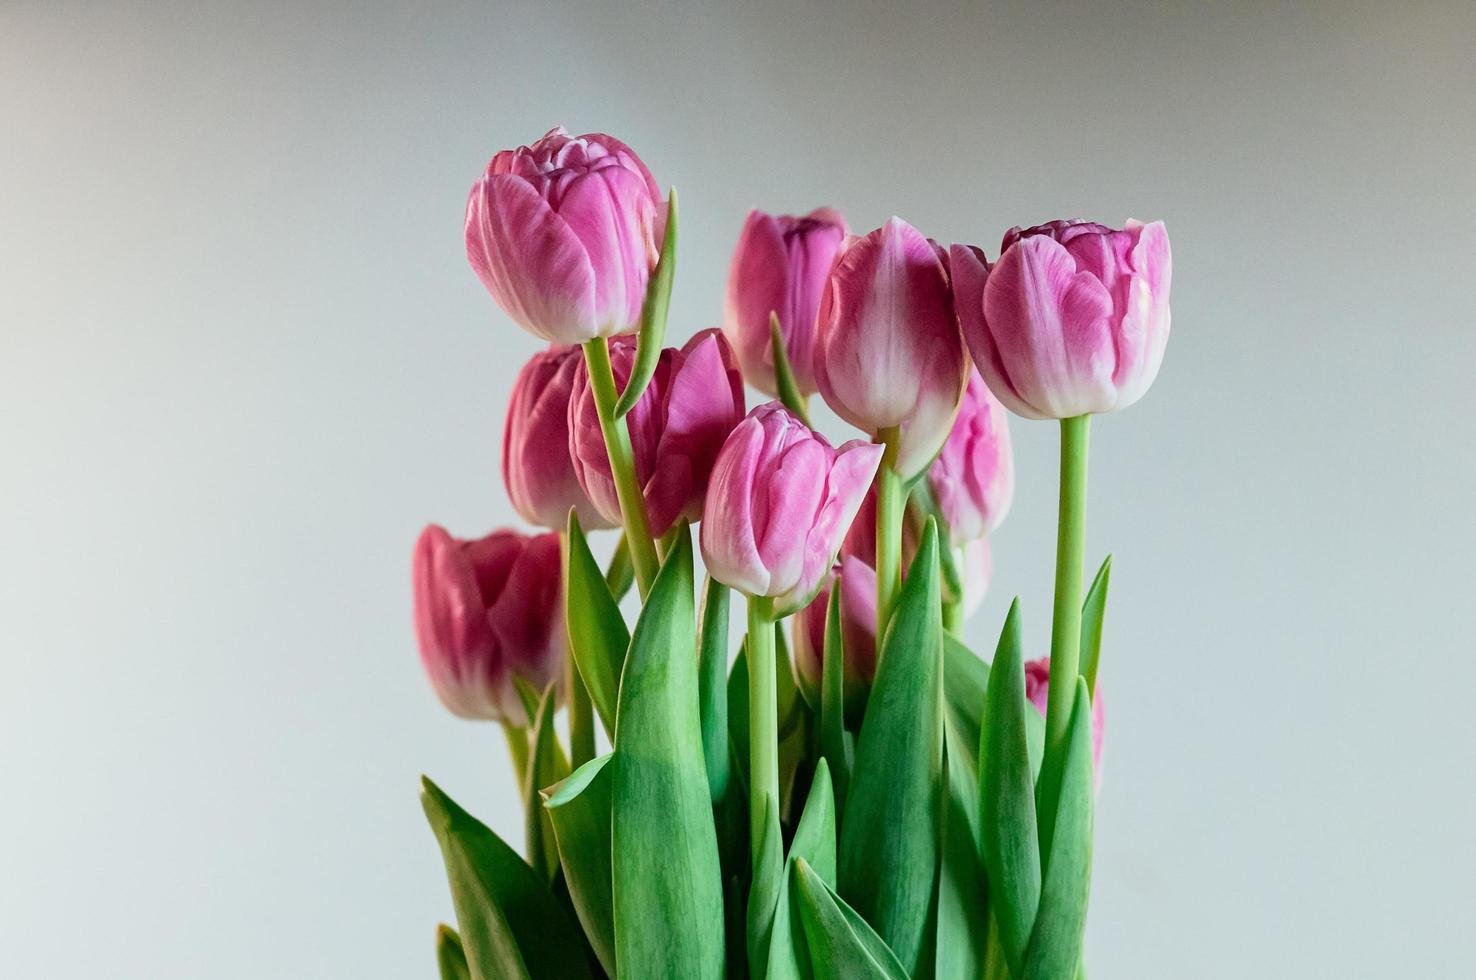 incantevoli fiori rosa peonia tulipani foto